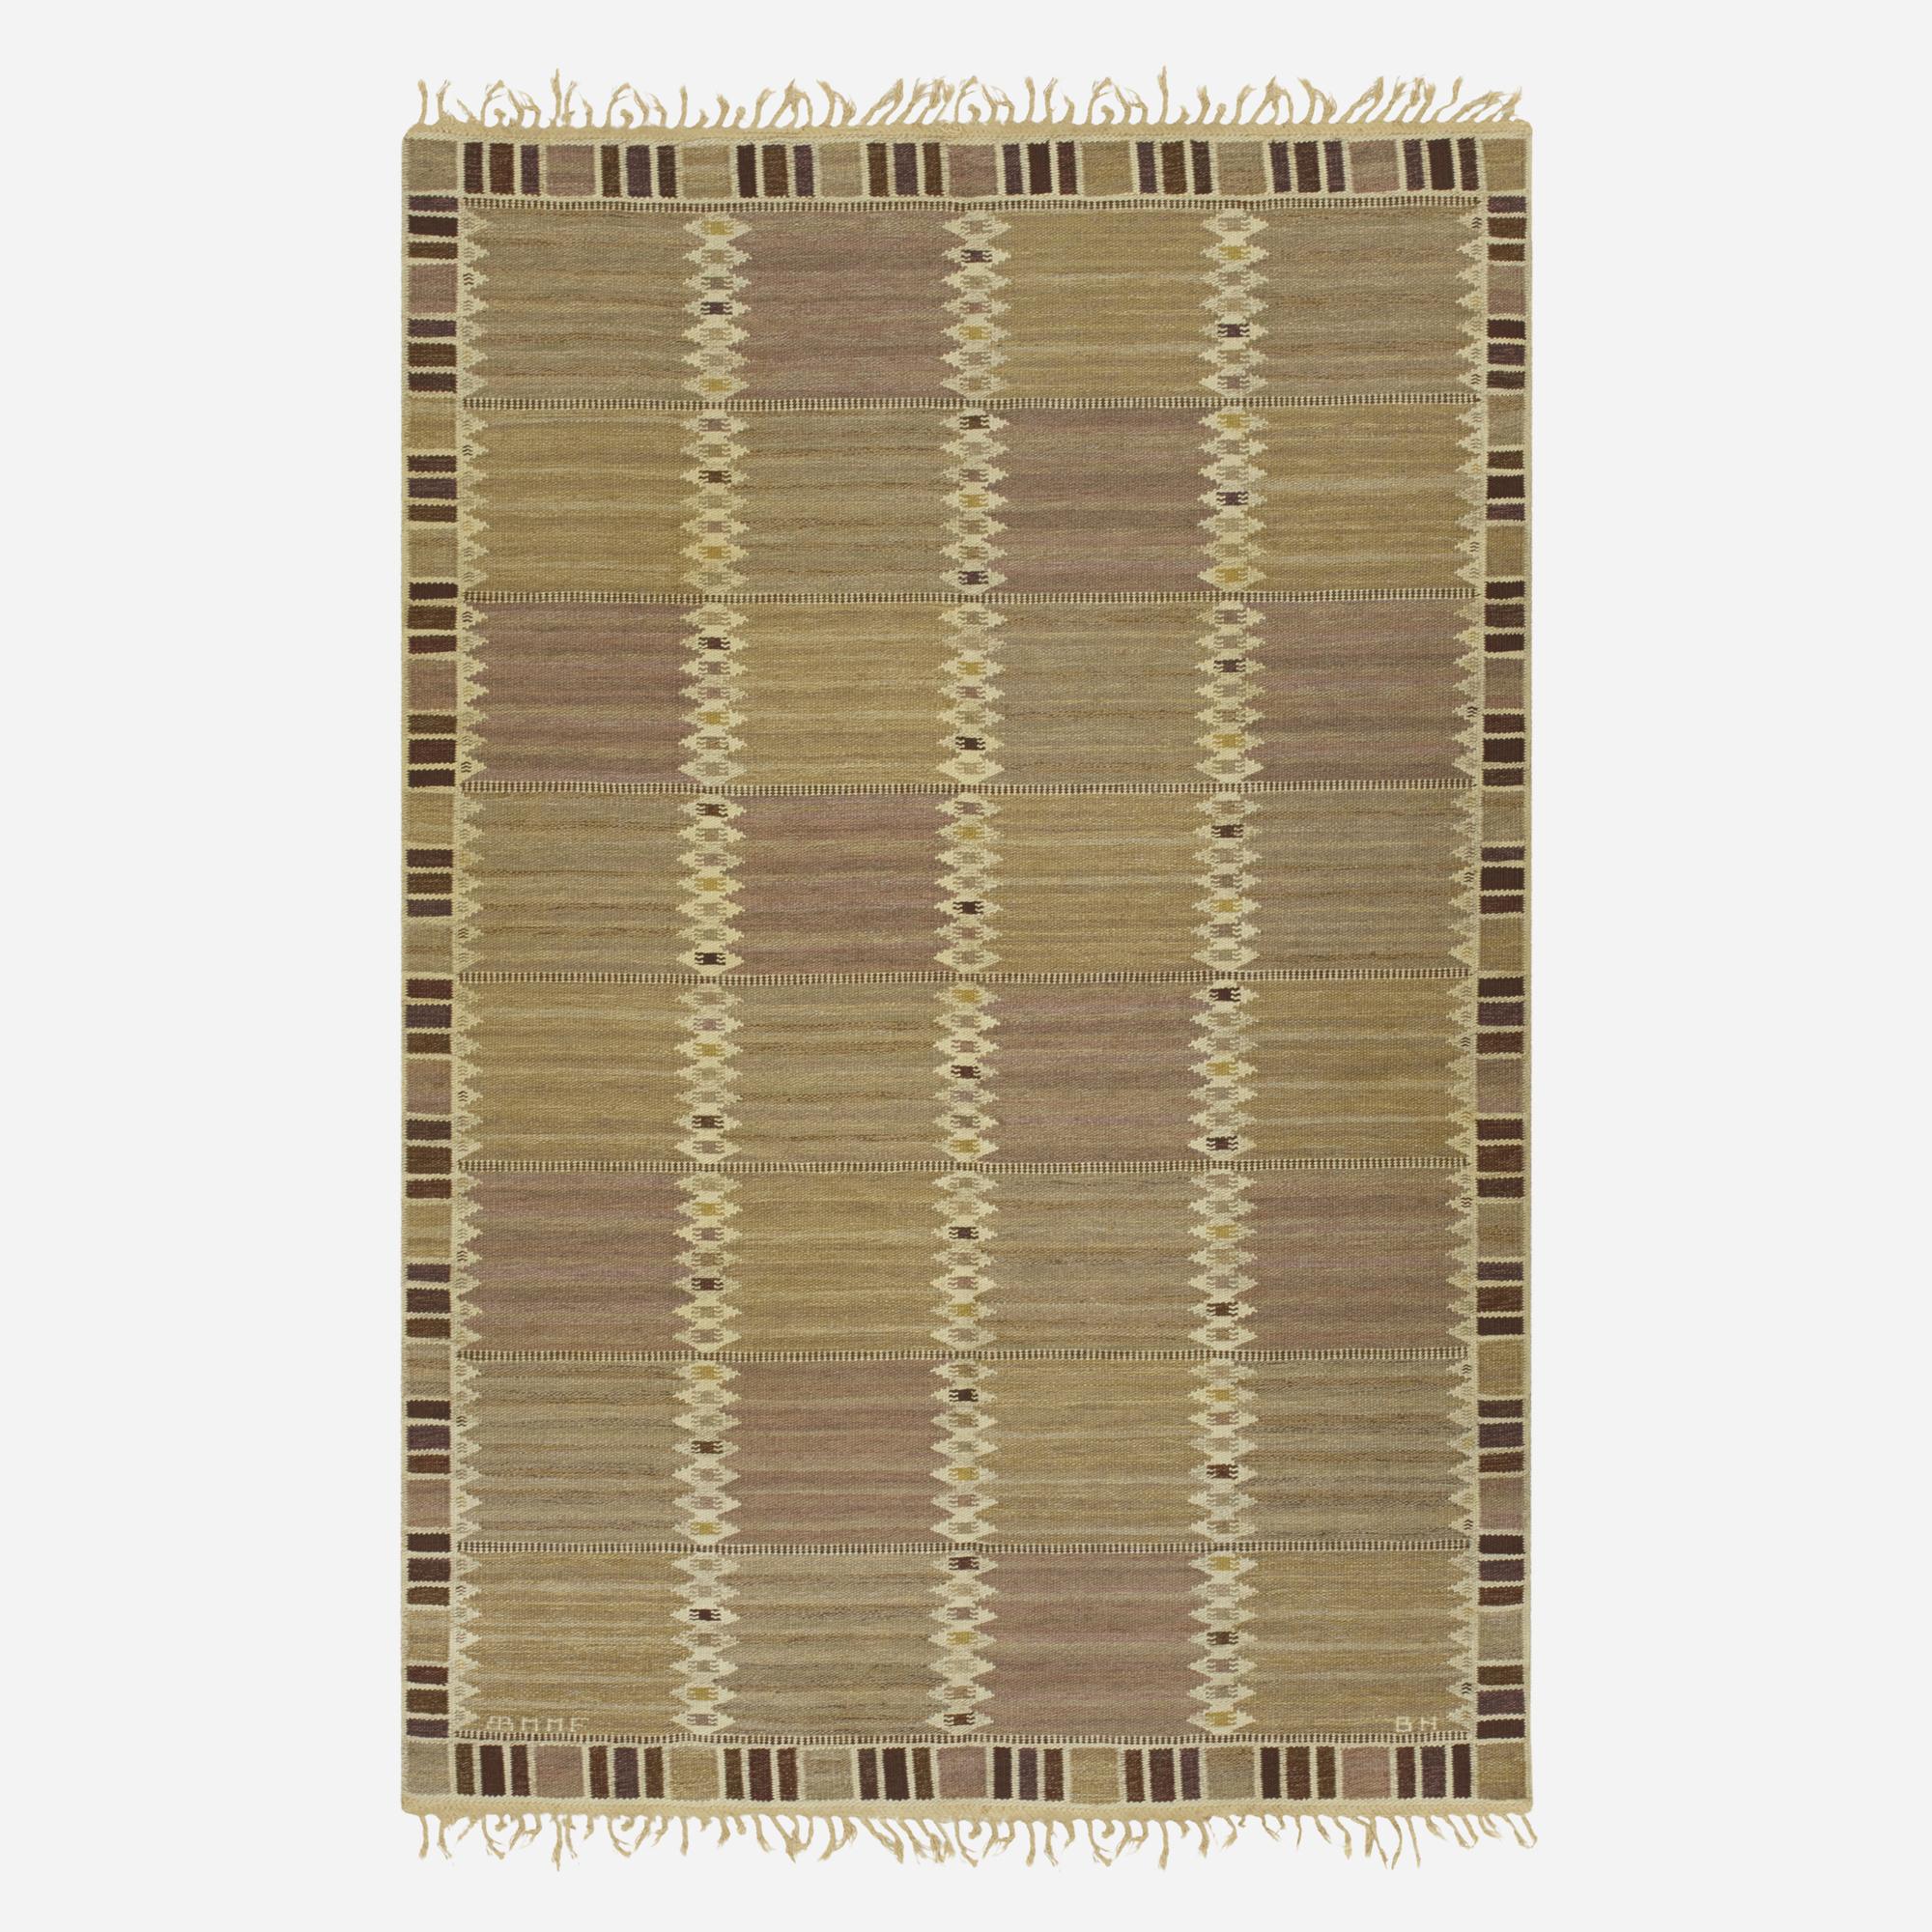 120: Barbro Nilsson / Salerno flatweave carpet (1 of 1)